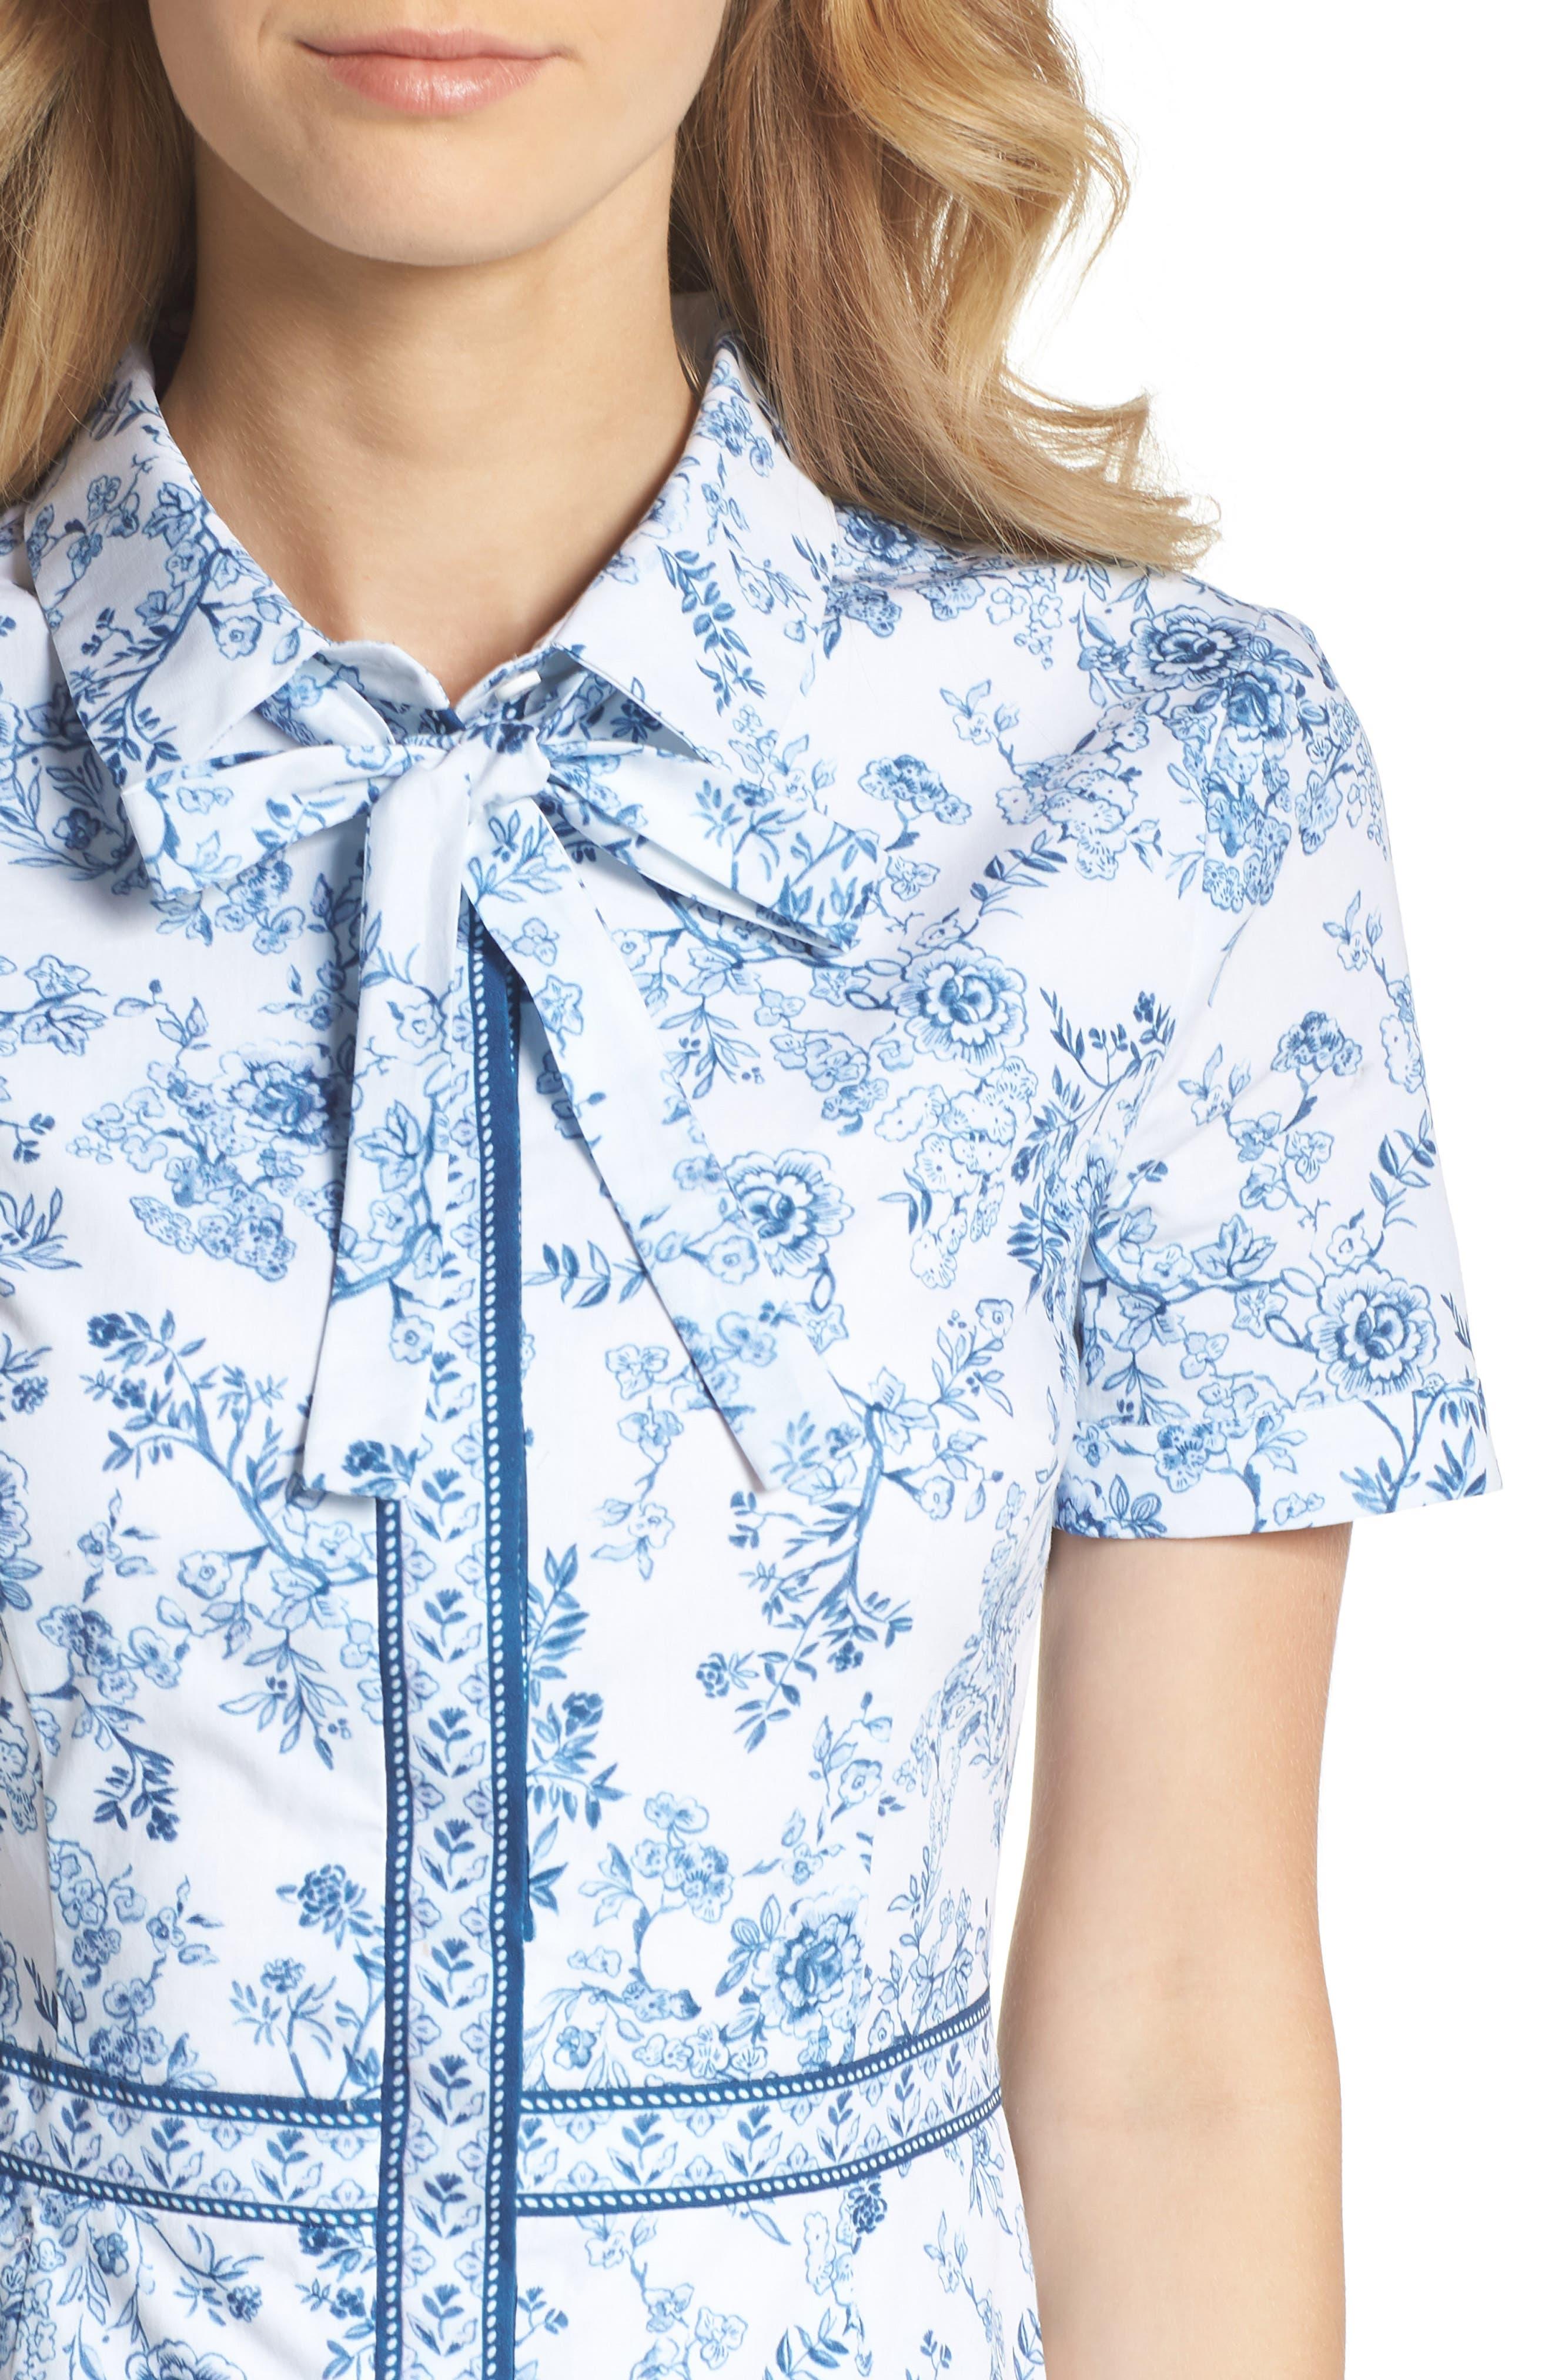 Darla Cotton Toile Shirtdress,                             Alternate thumbnail 4, color,                             415